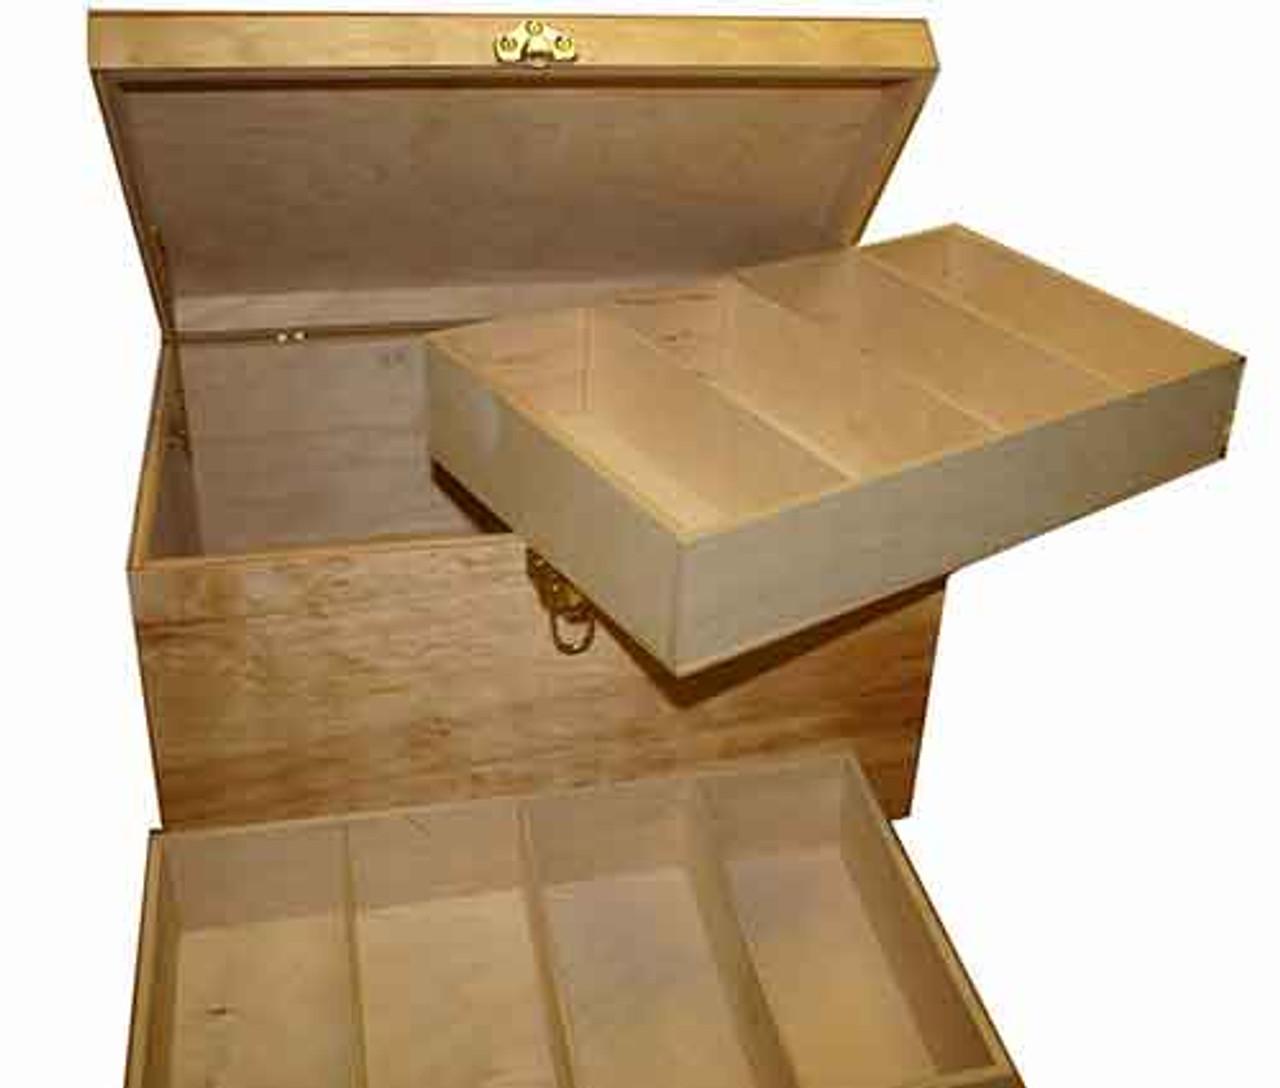 HVR Traditional Carring Case - Medium Slot Box - HVR-105